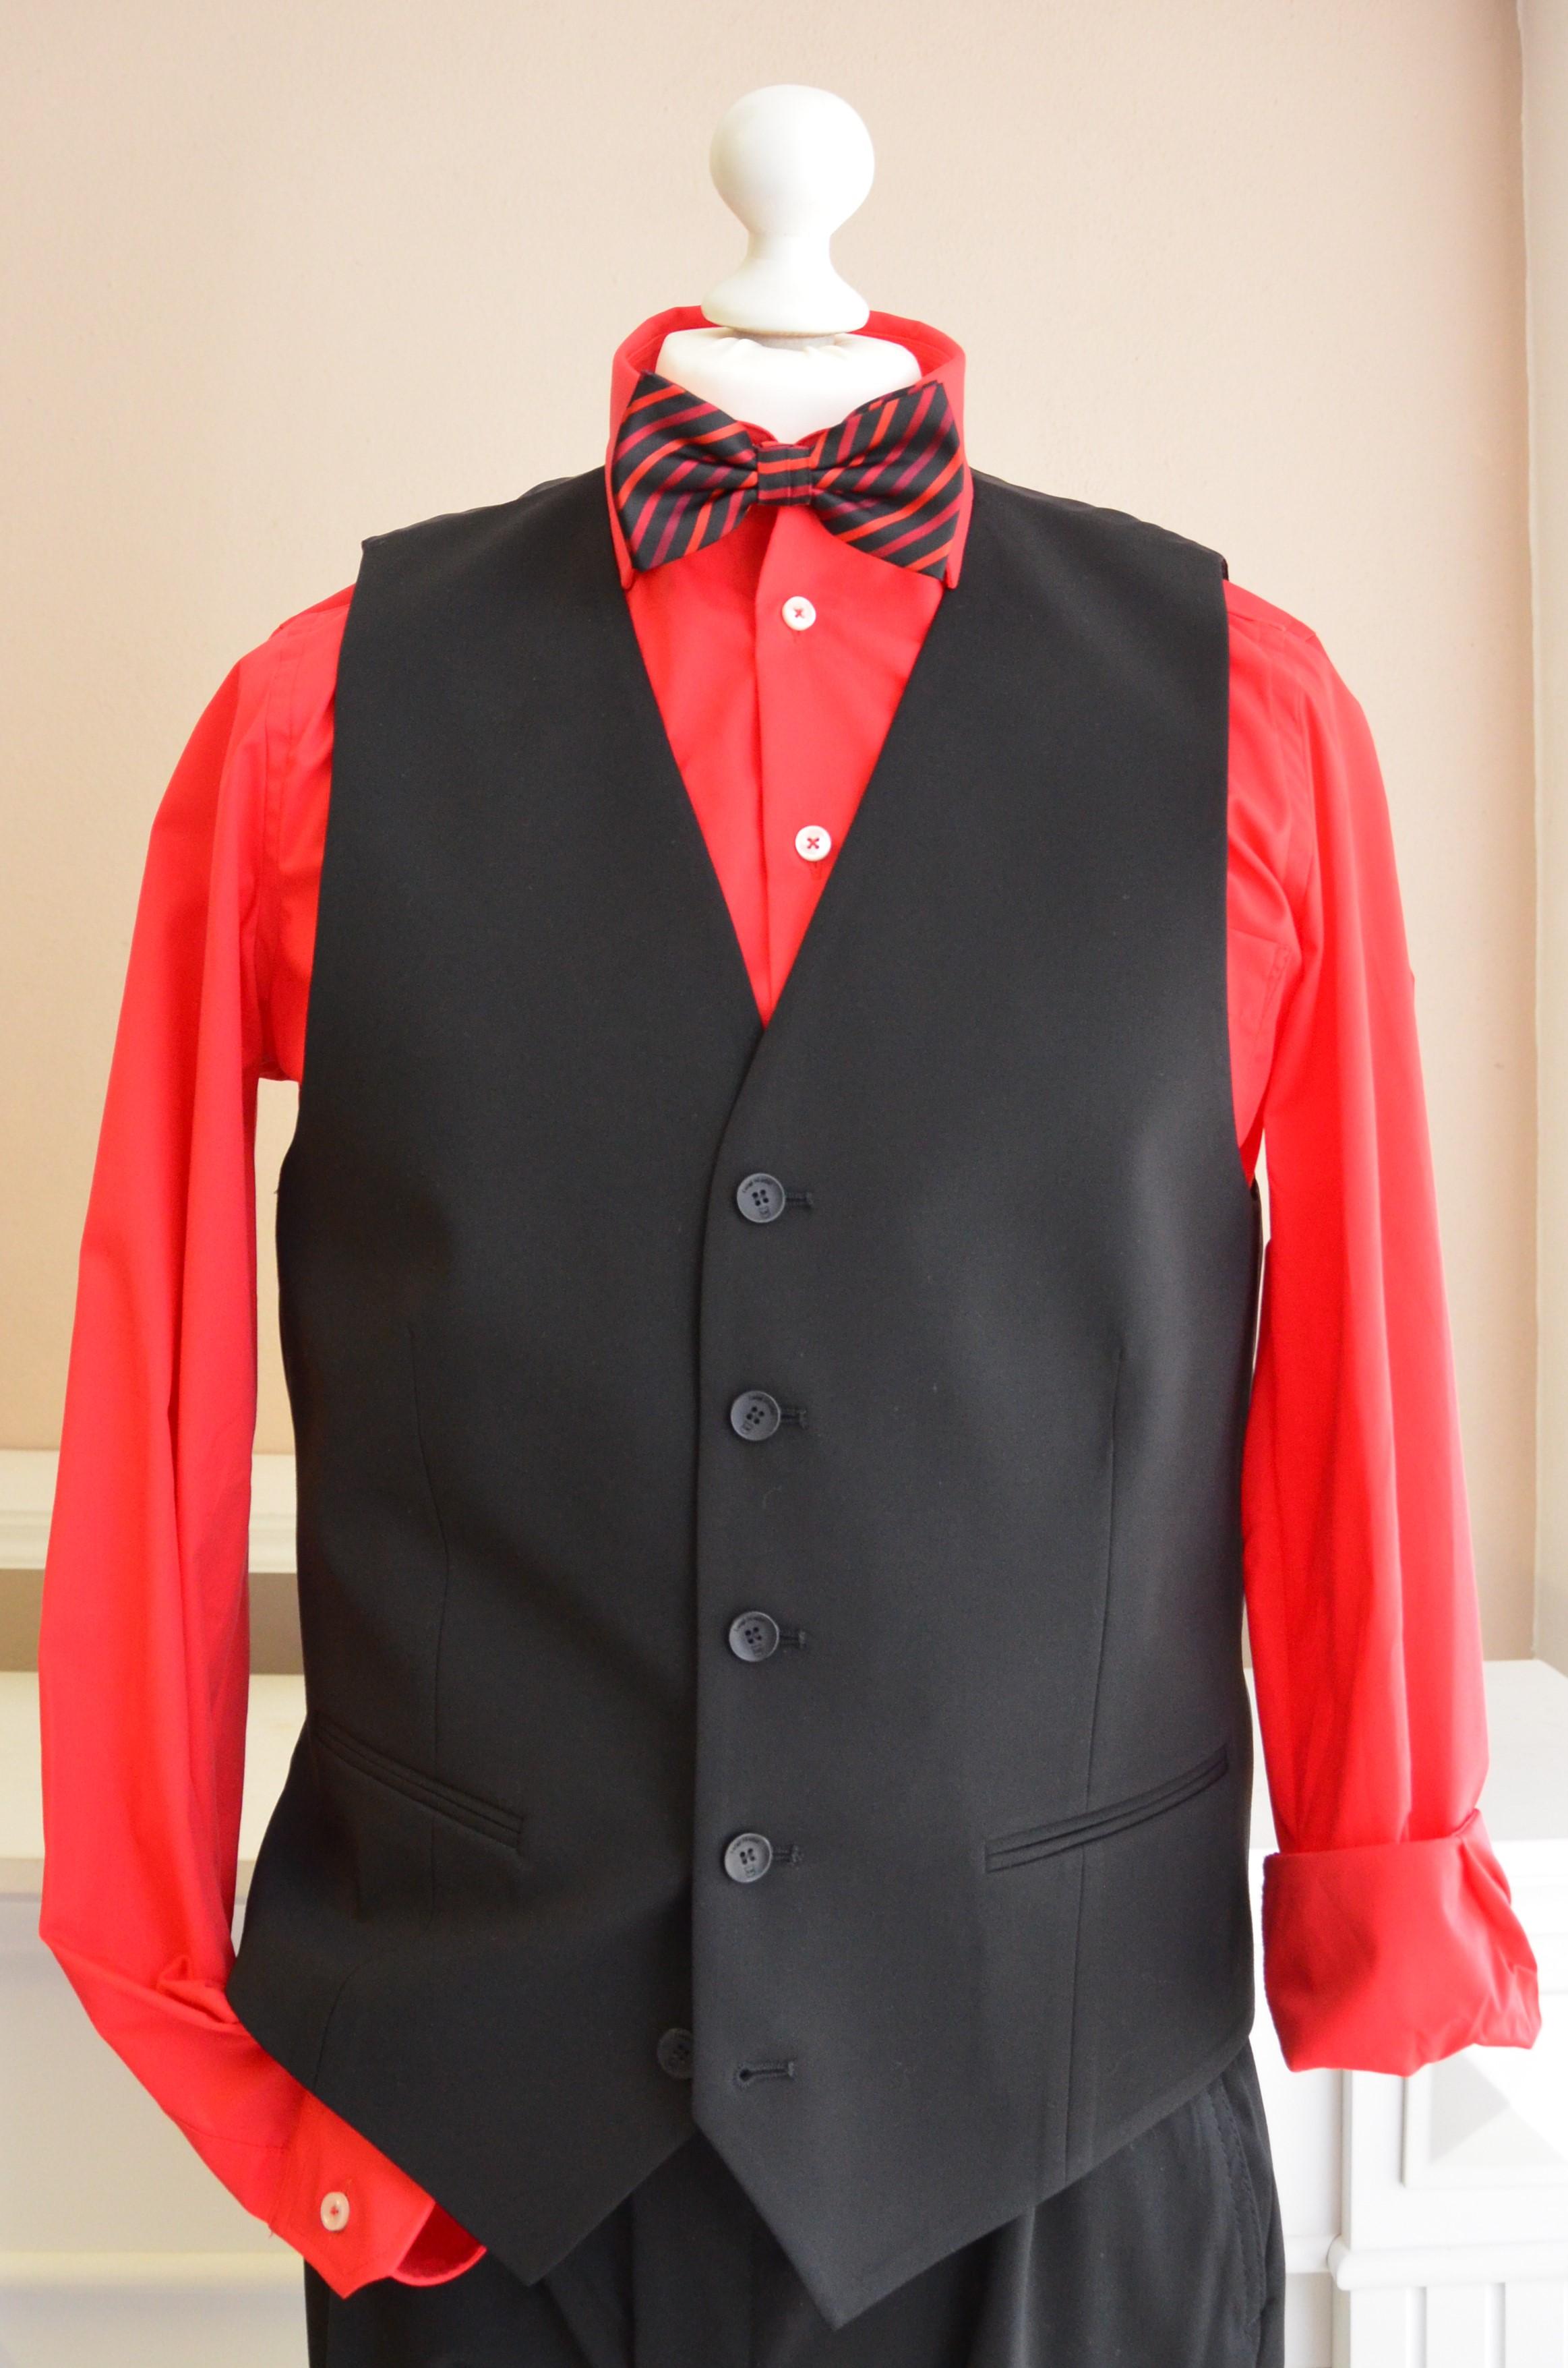 Anzugs-Weste schwarz